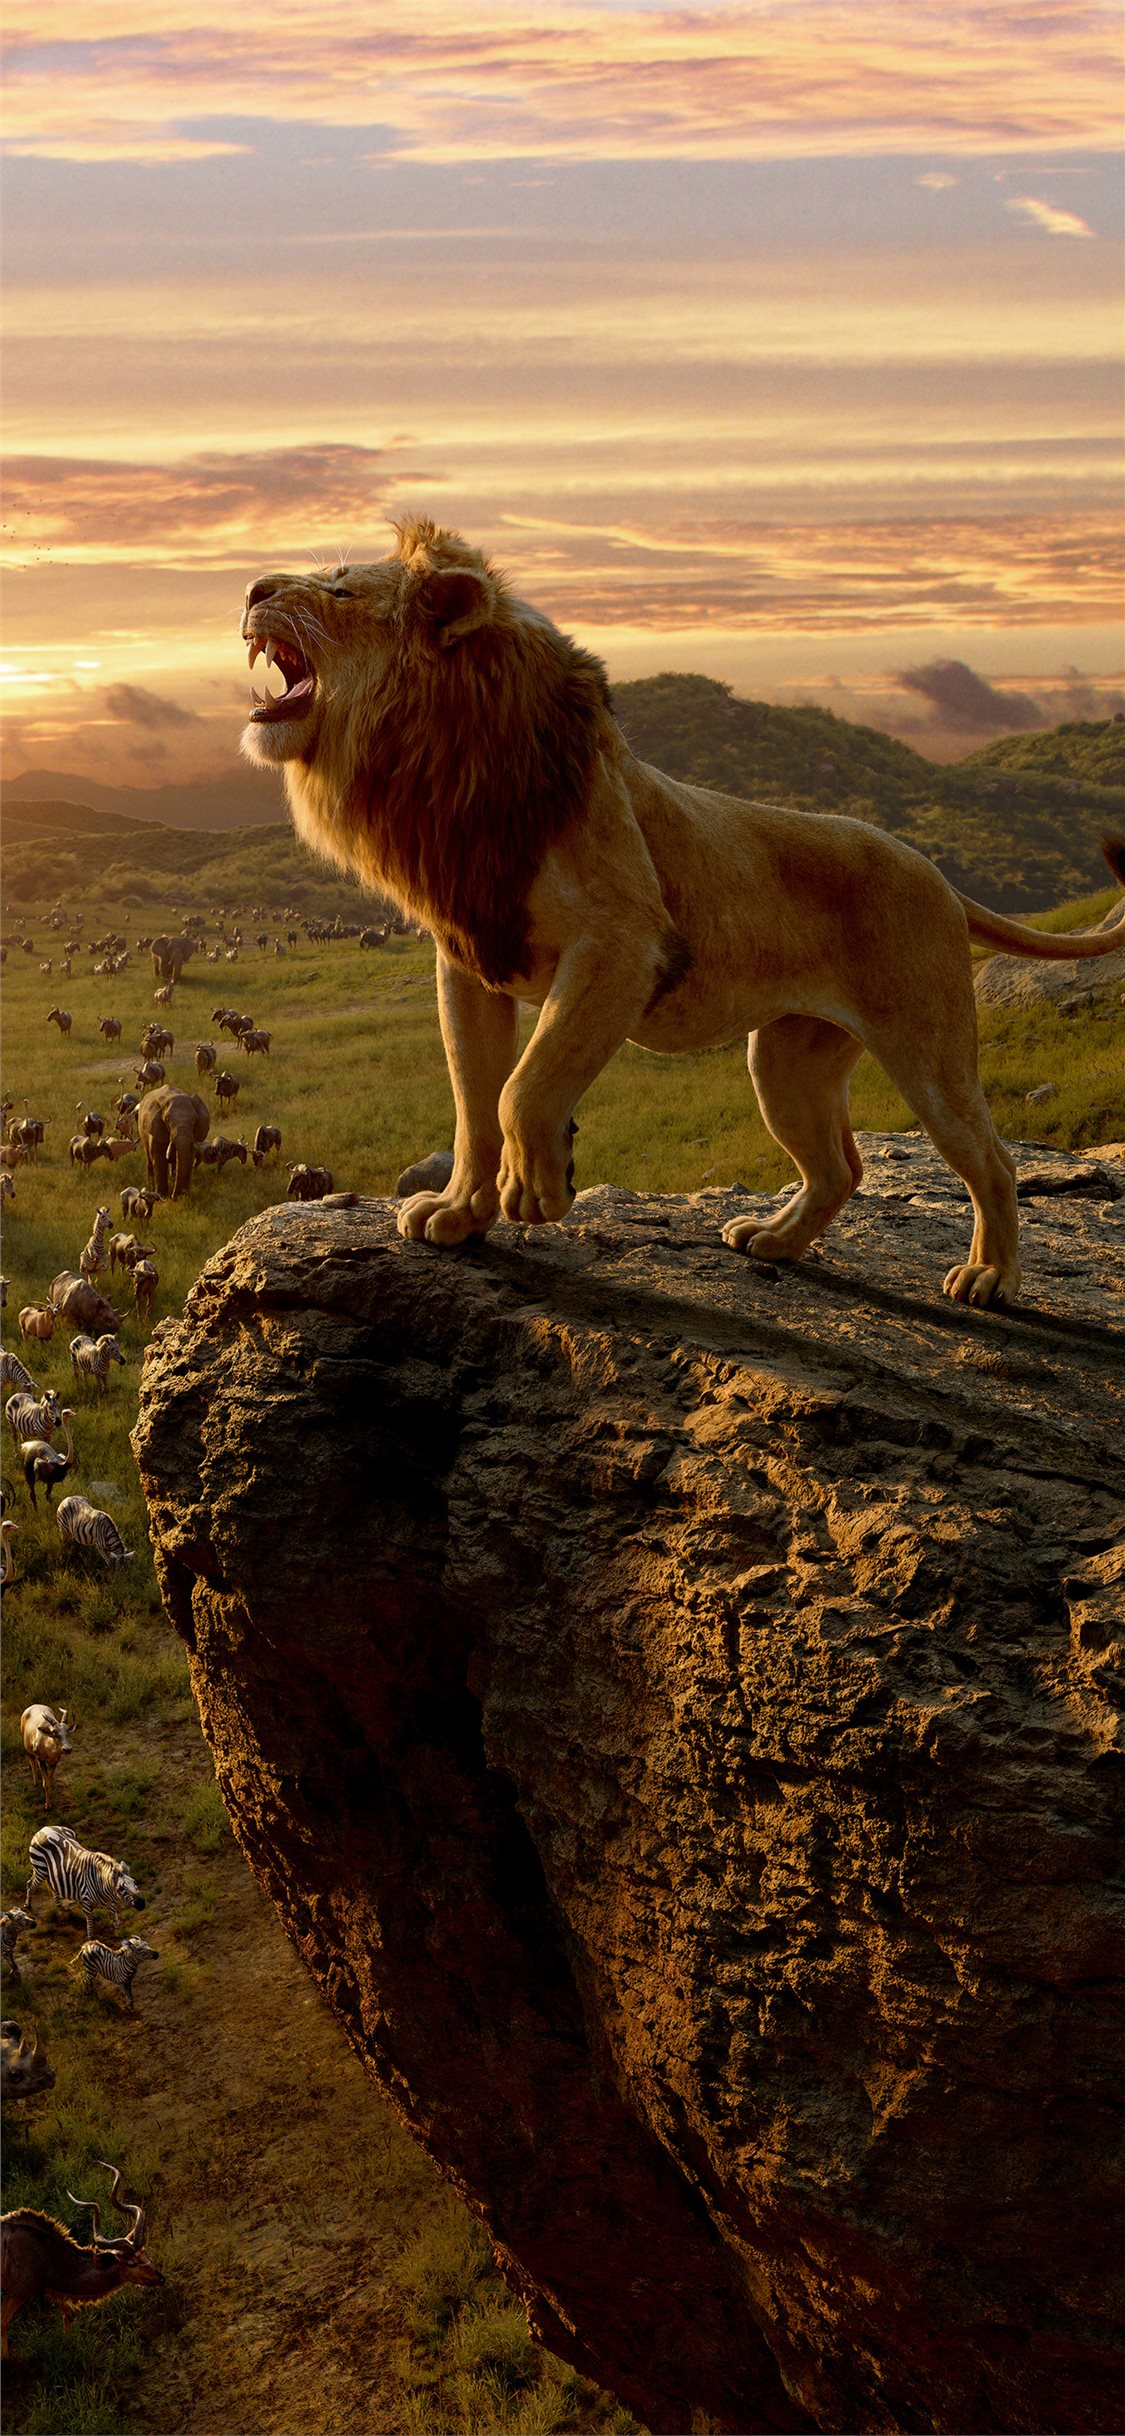 Lion King Wallpaper 4k , HD Wallpaper & Backgrounds